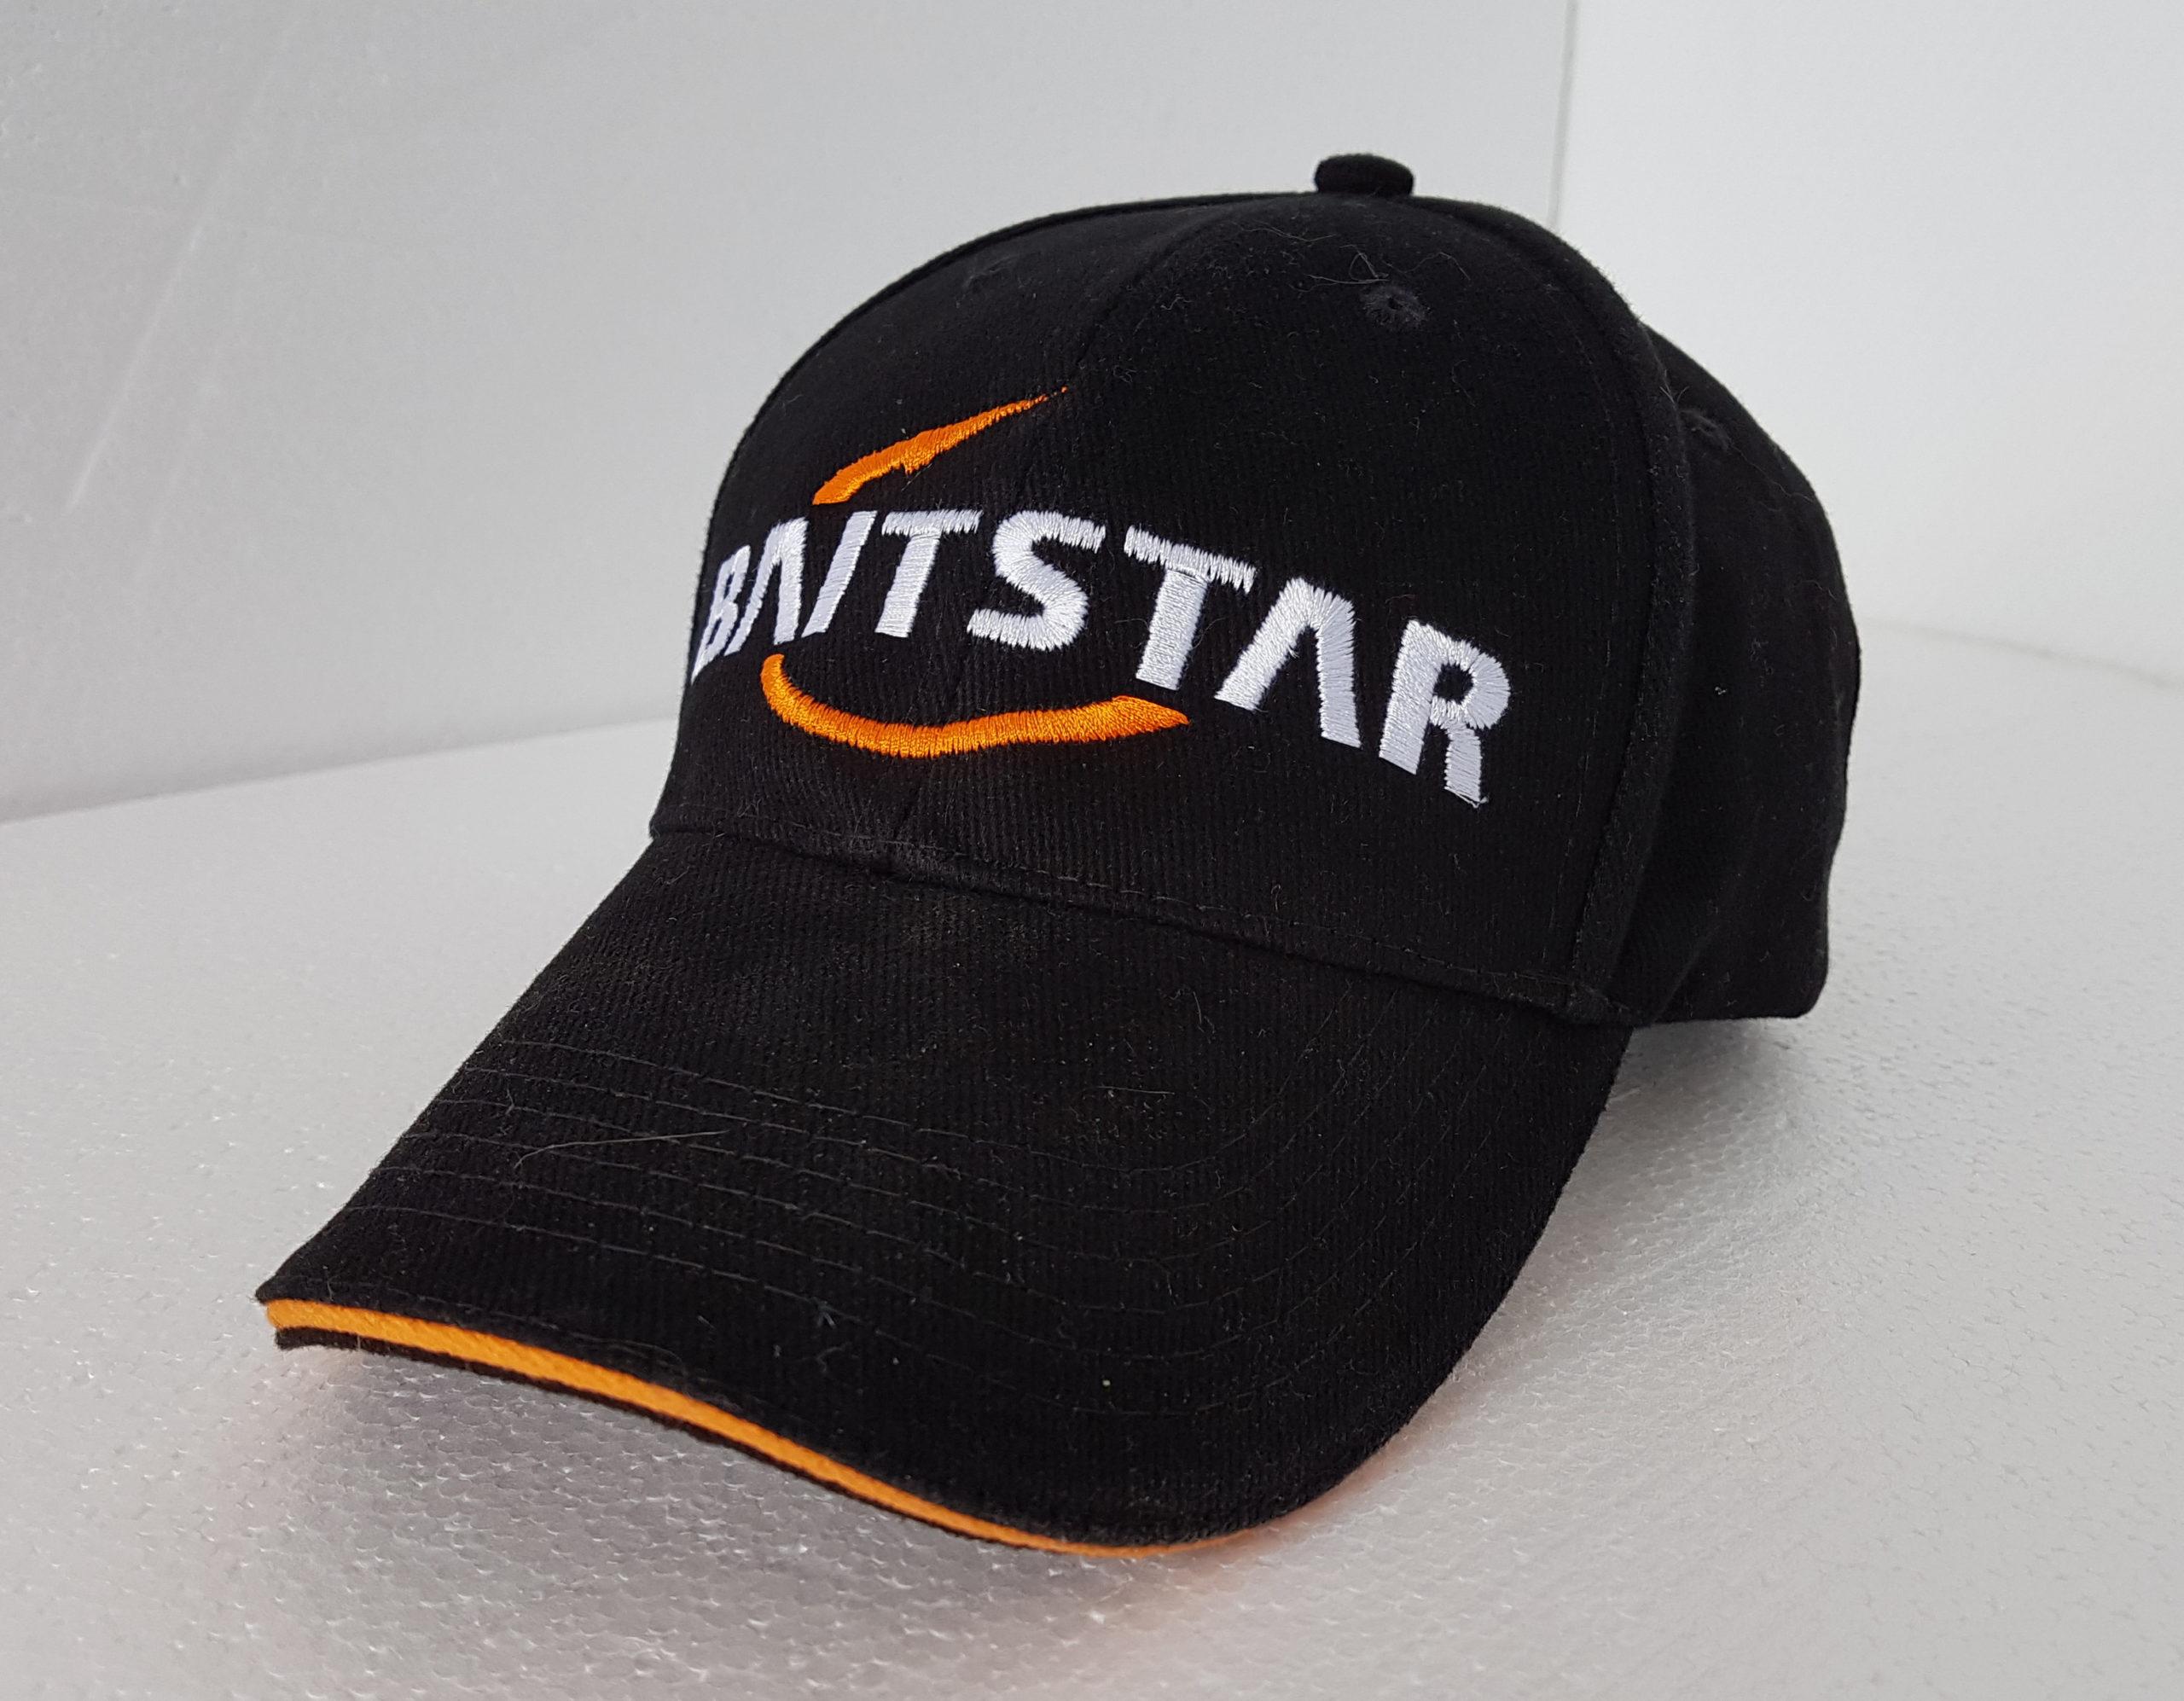 BaitStar-Cap-1